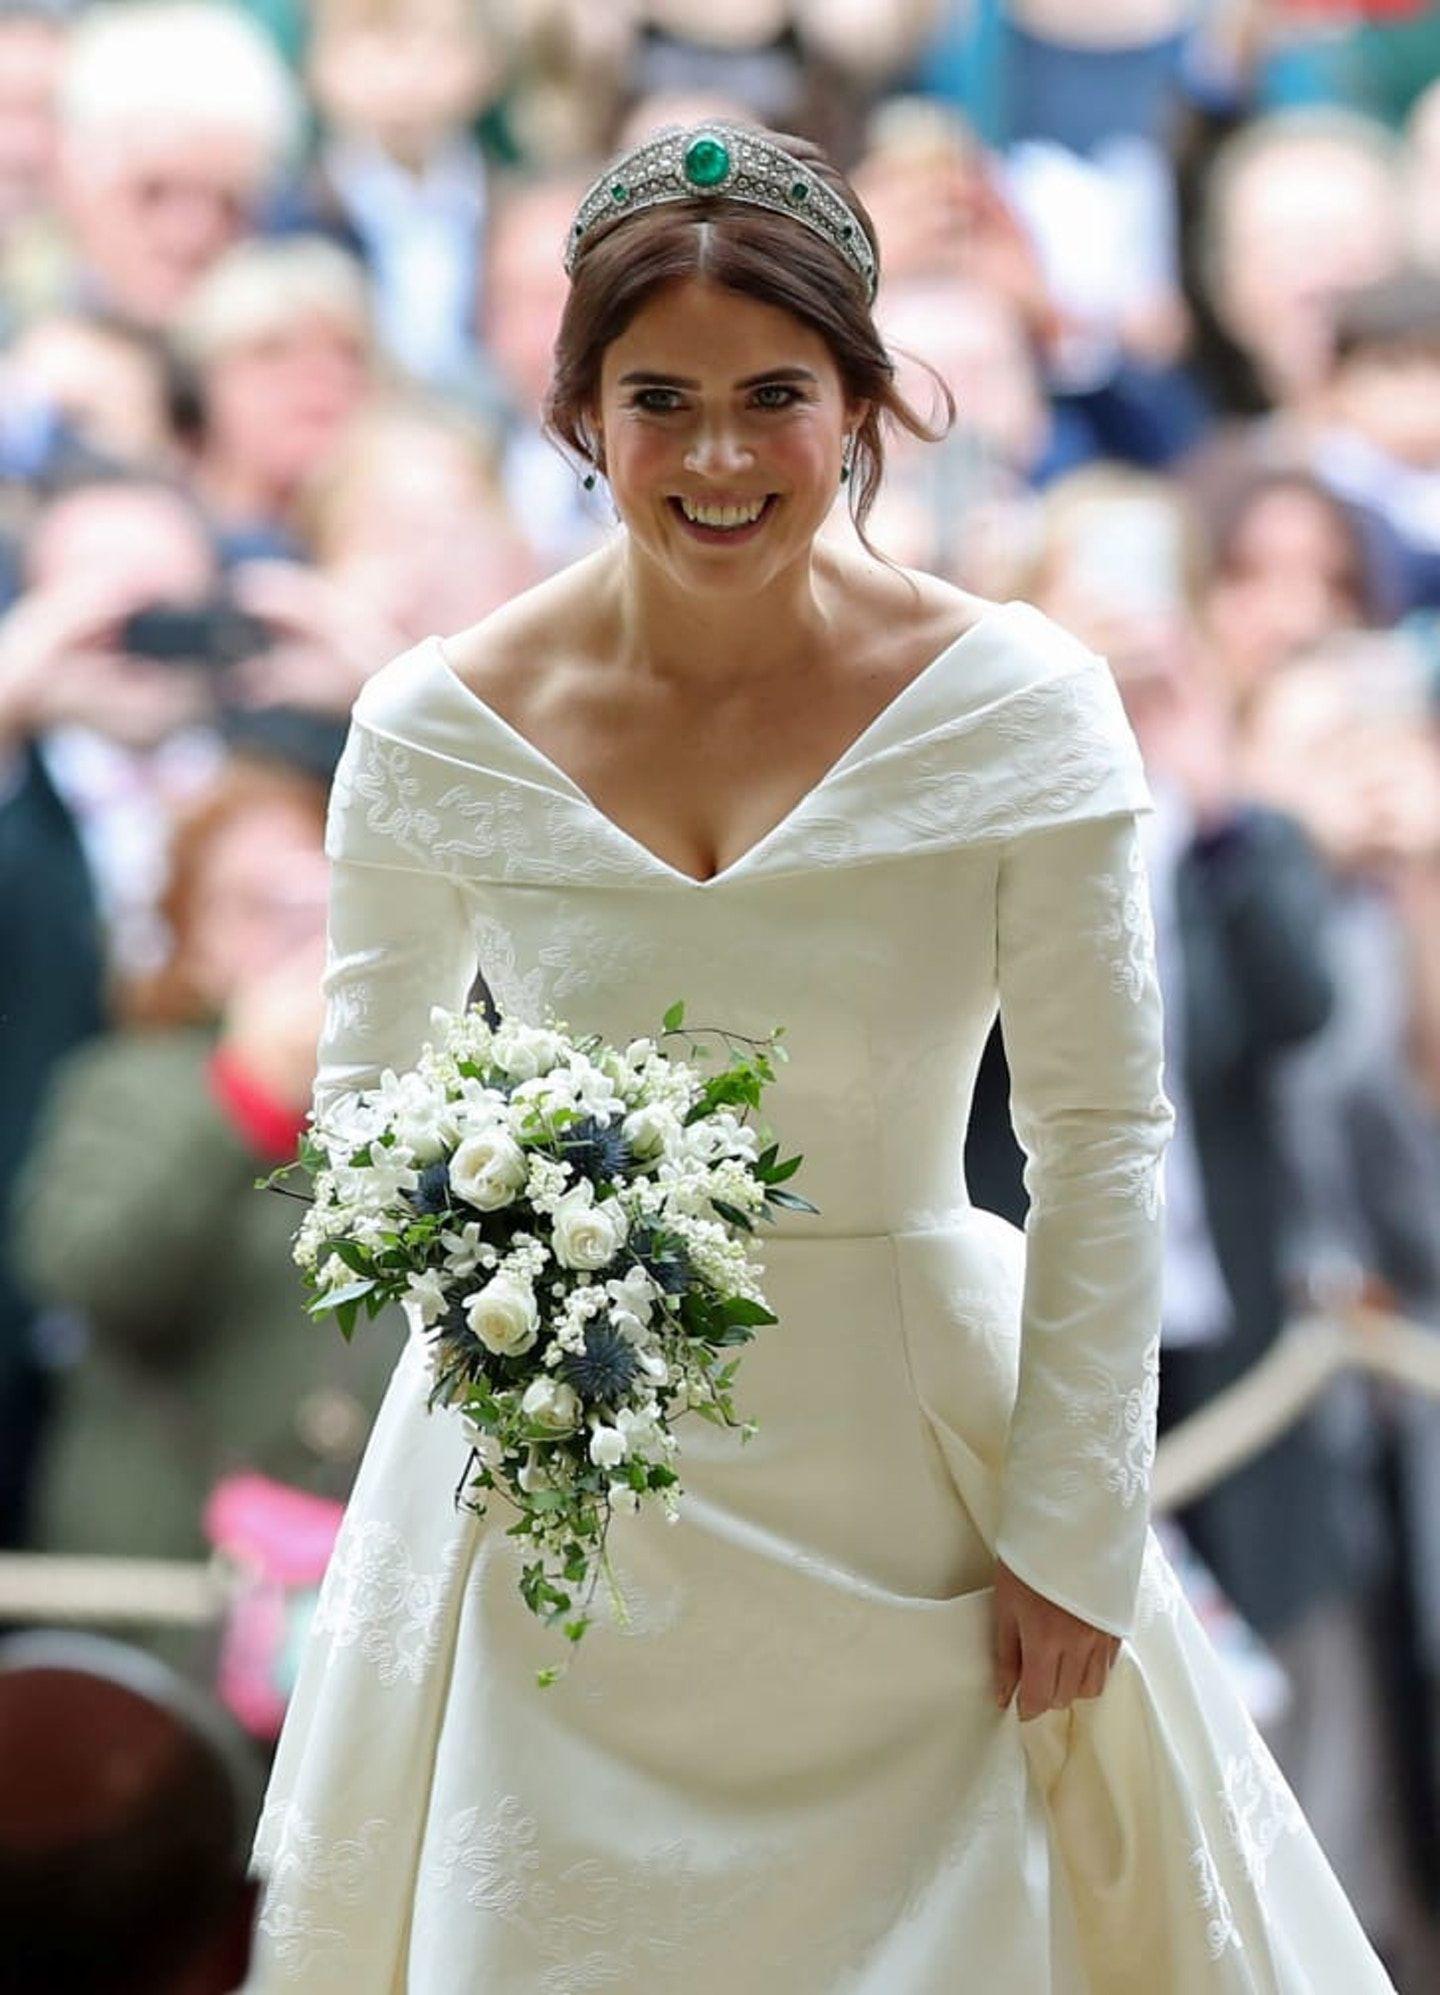 Royal Wedding Of Princess Eugenie Wedding Look Eugenie Wedding Royal Wedding Dress Wedding Dresses [ 1995 x 1440 Pixel ]